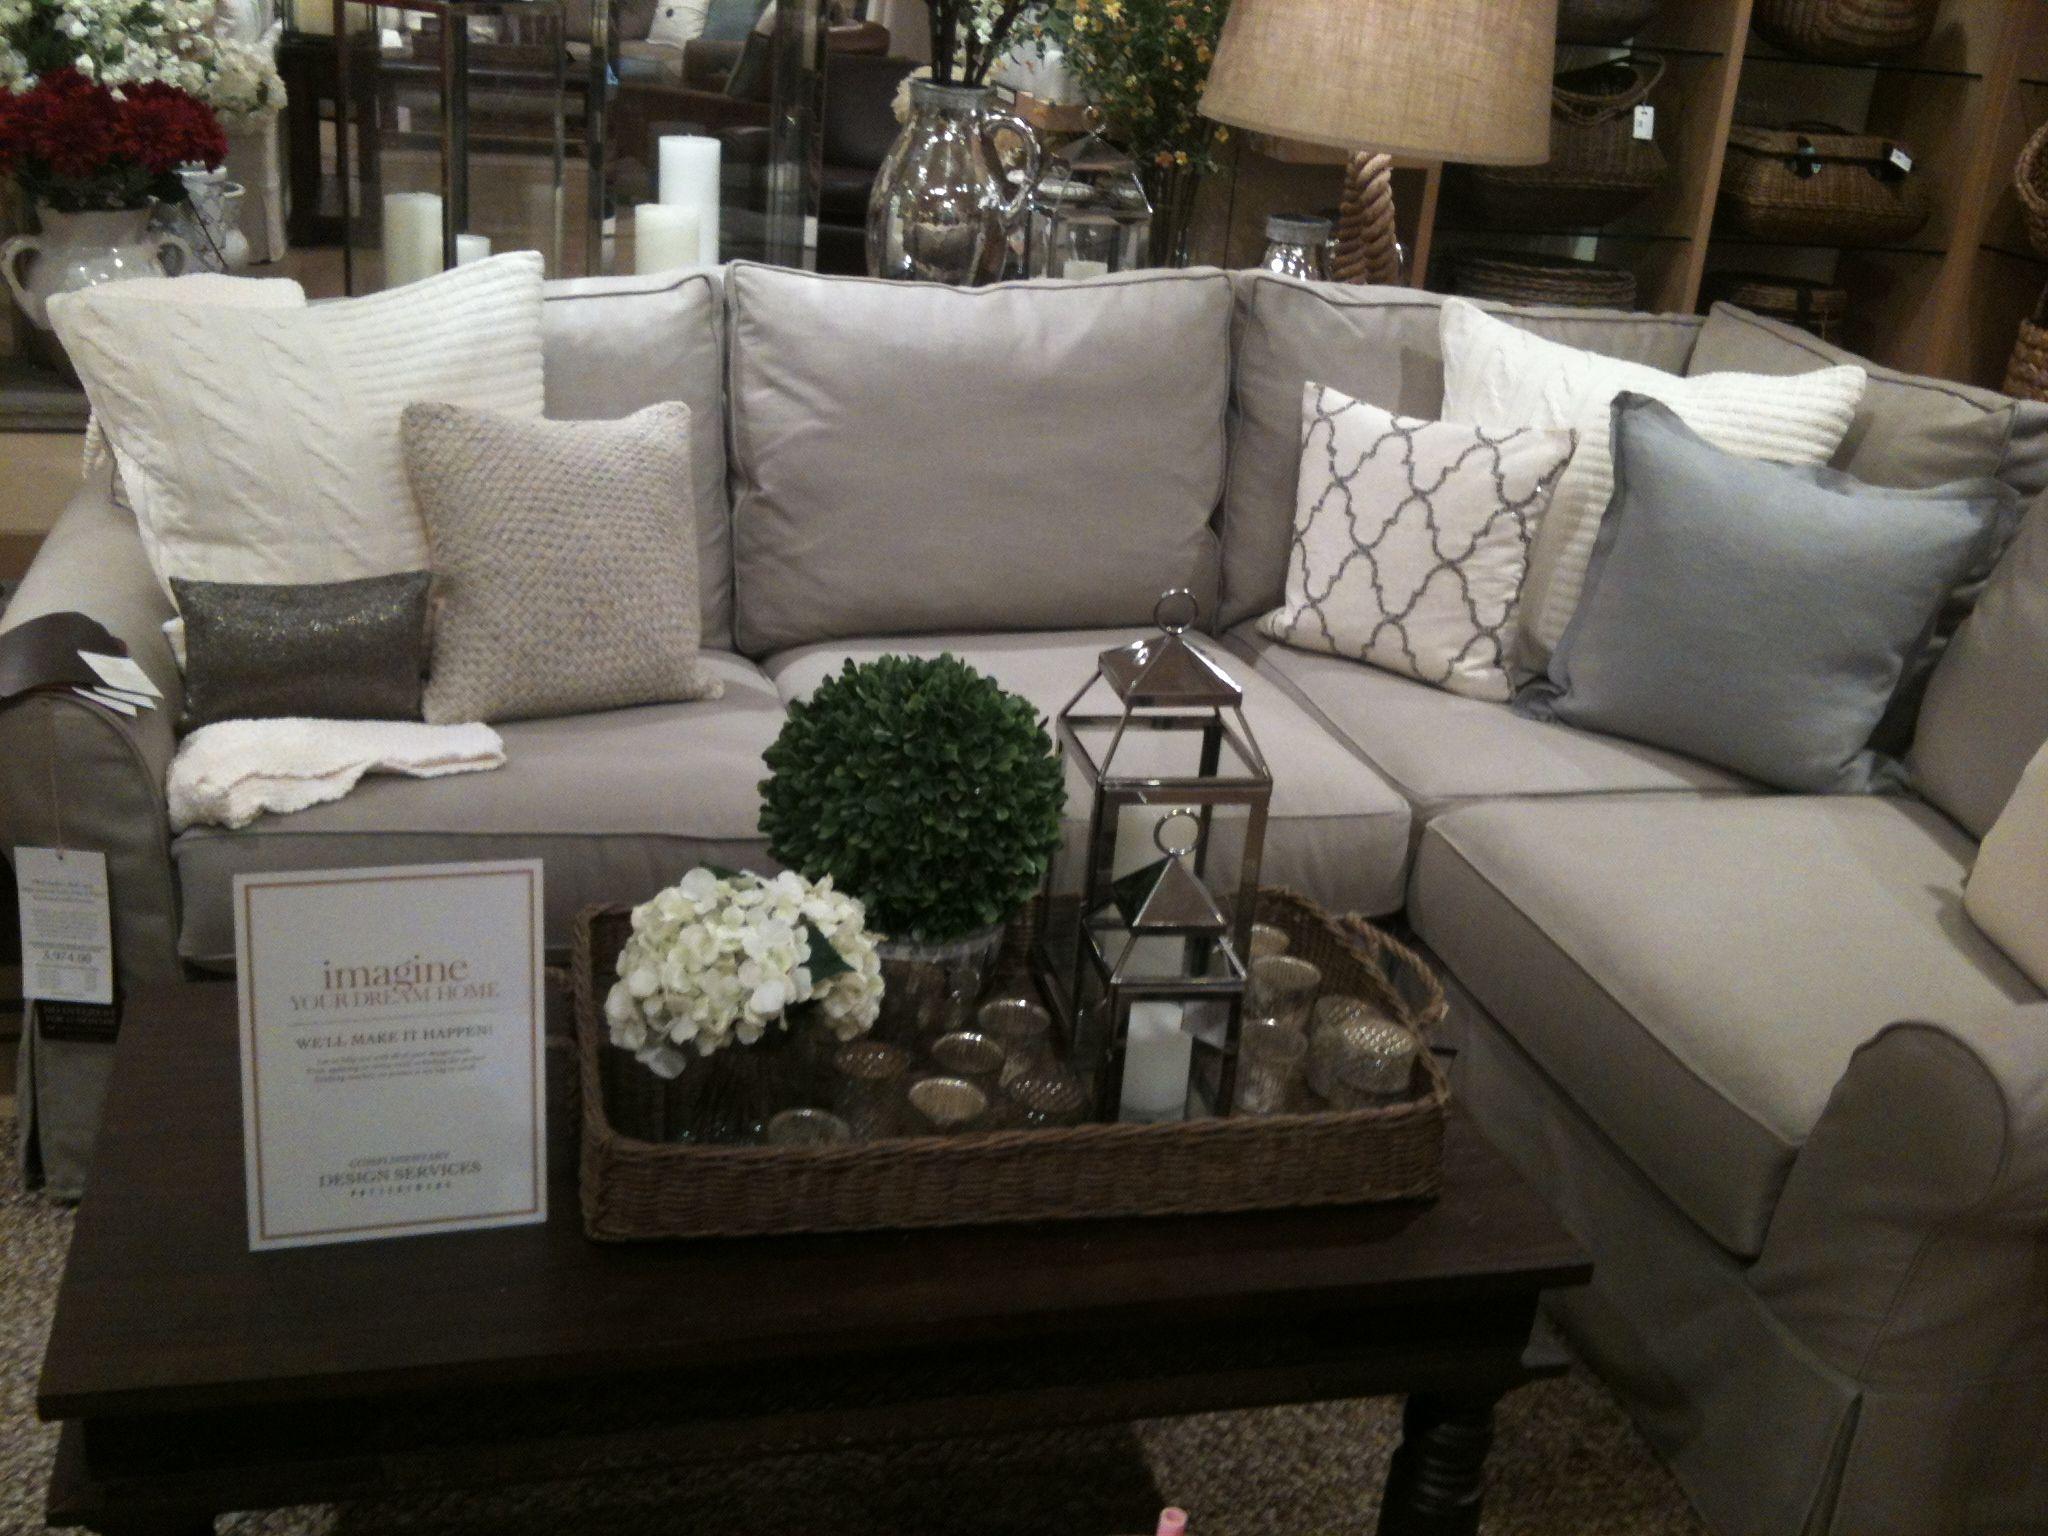 living room ideas light grey sofa mart austin tx pottery barn sectional pillows family